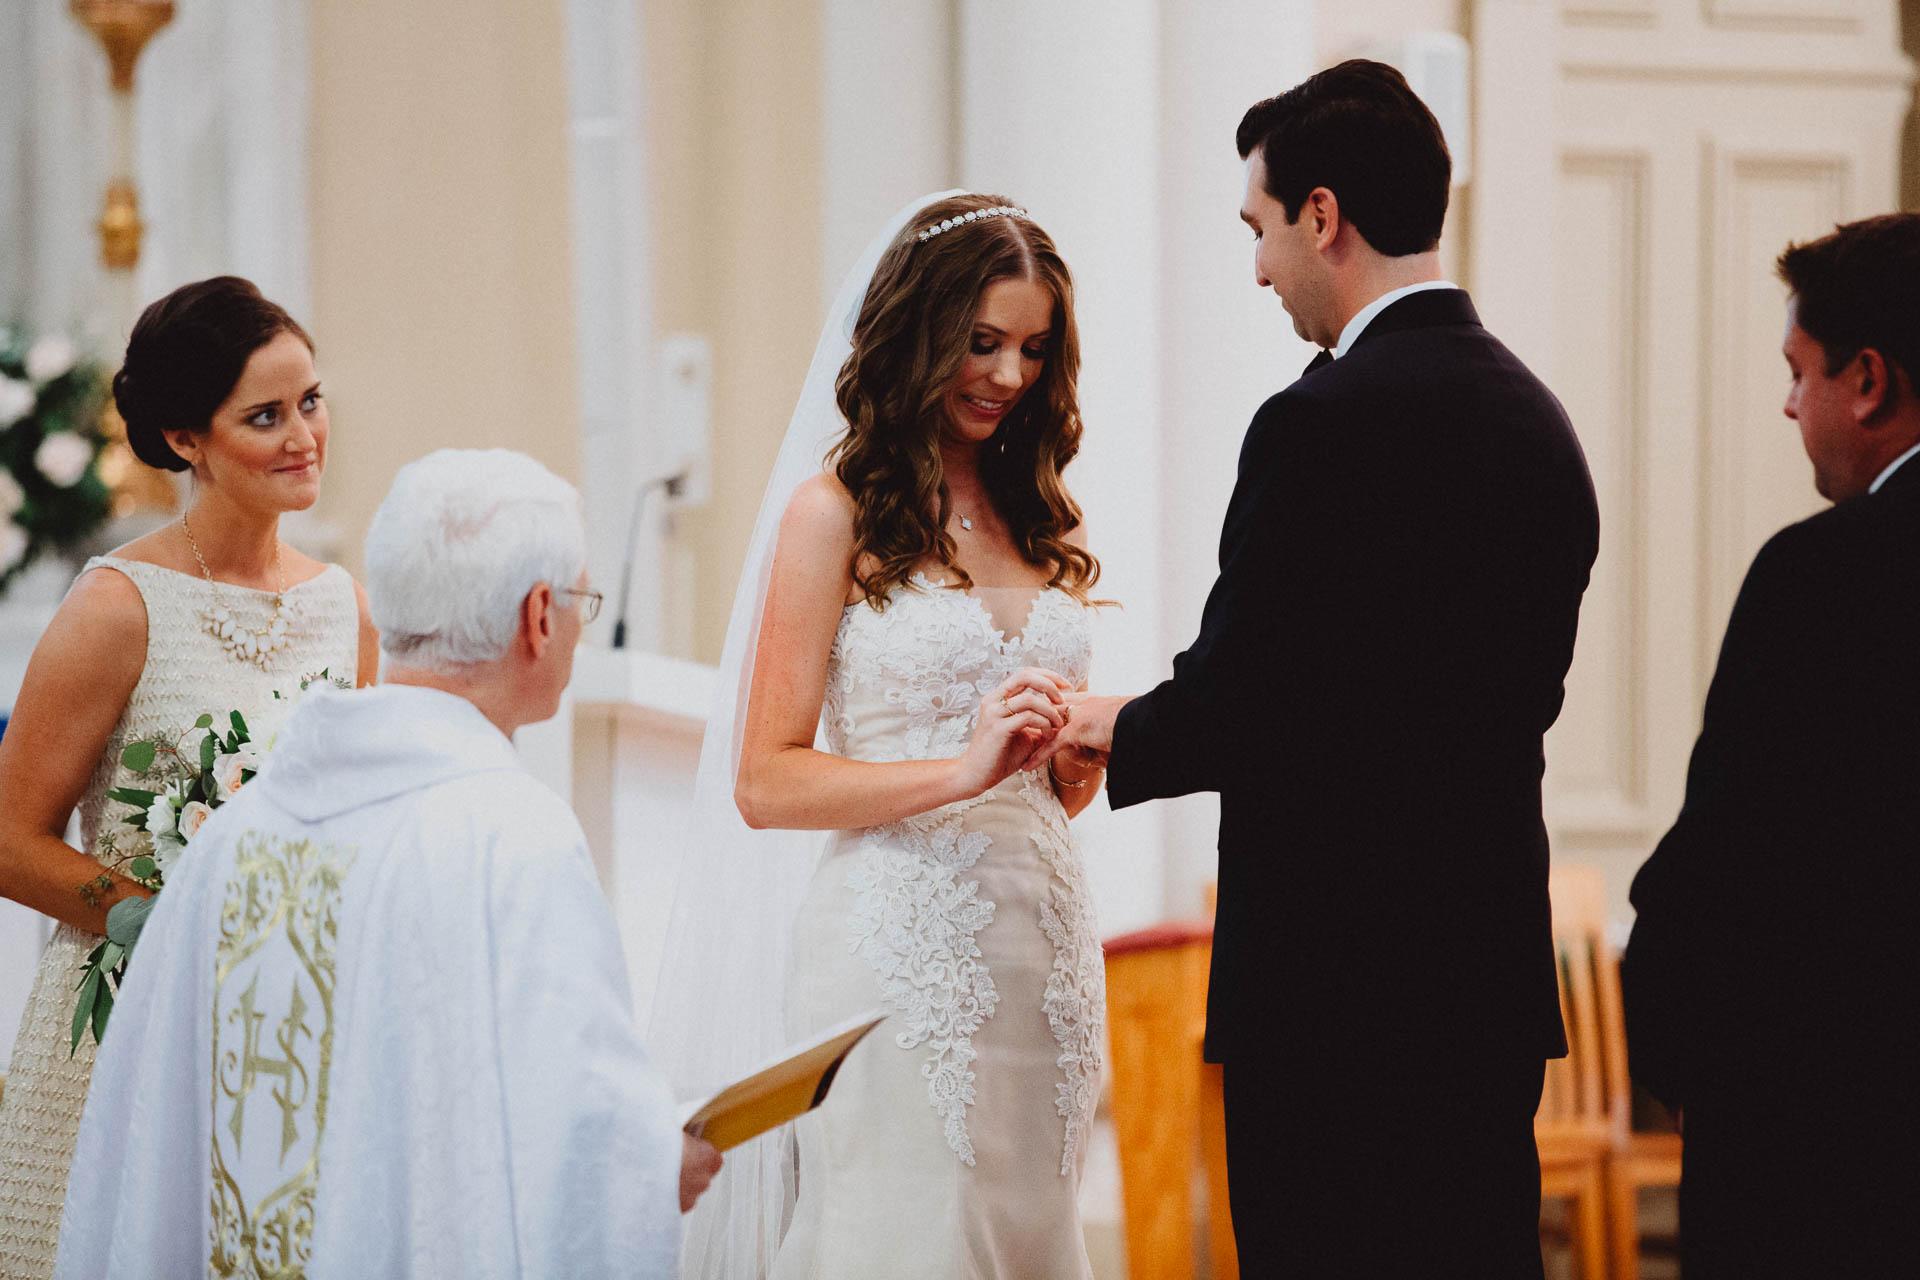 Keri-Joseph-Top-of-the-Market-Wedding-076@2x.jpg